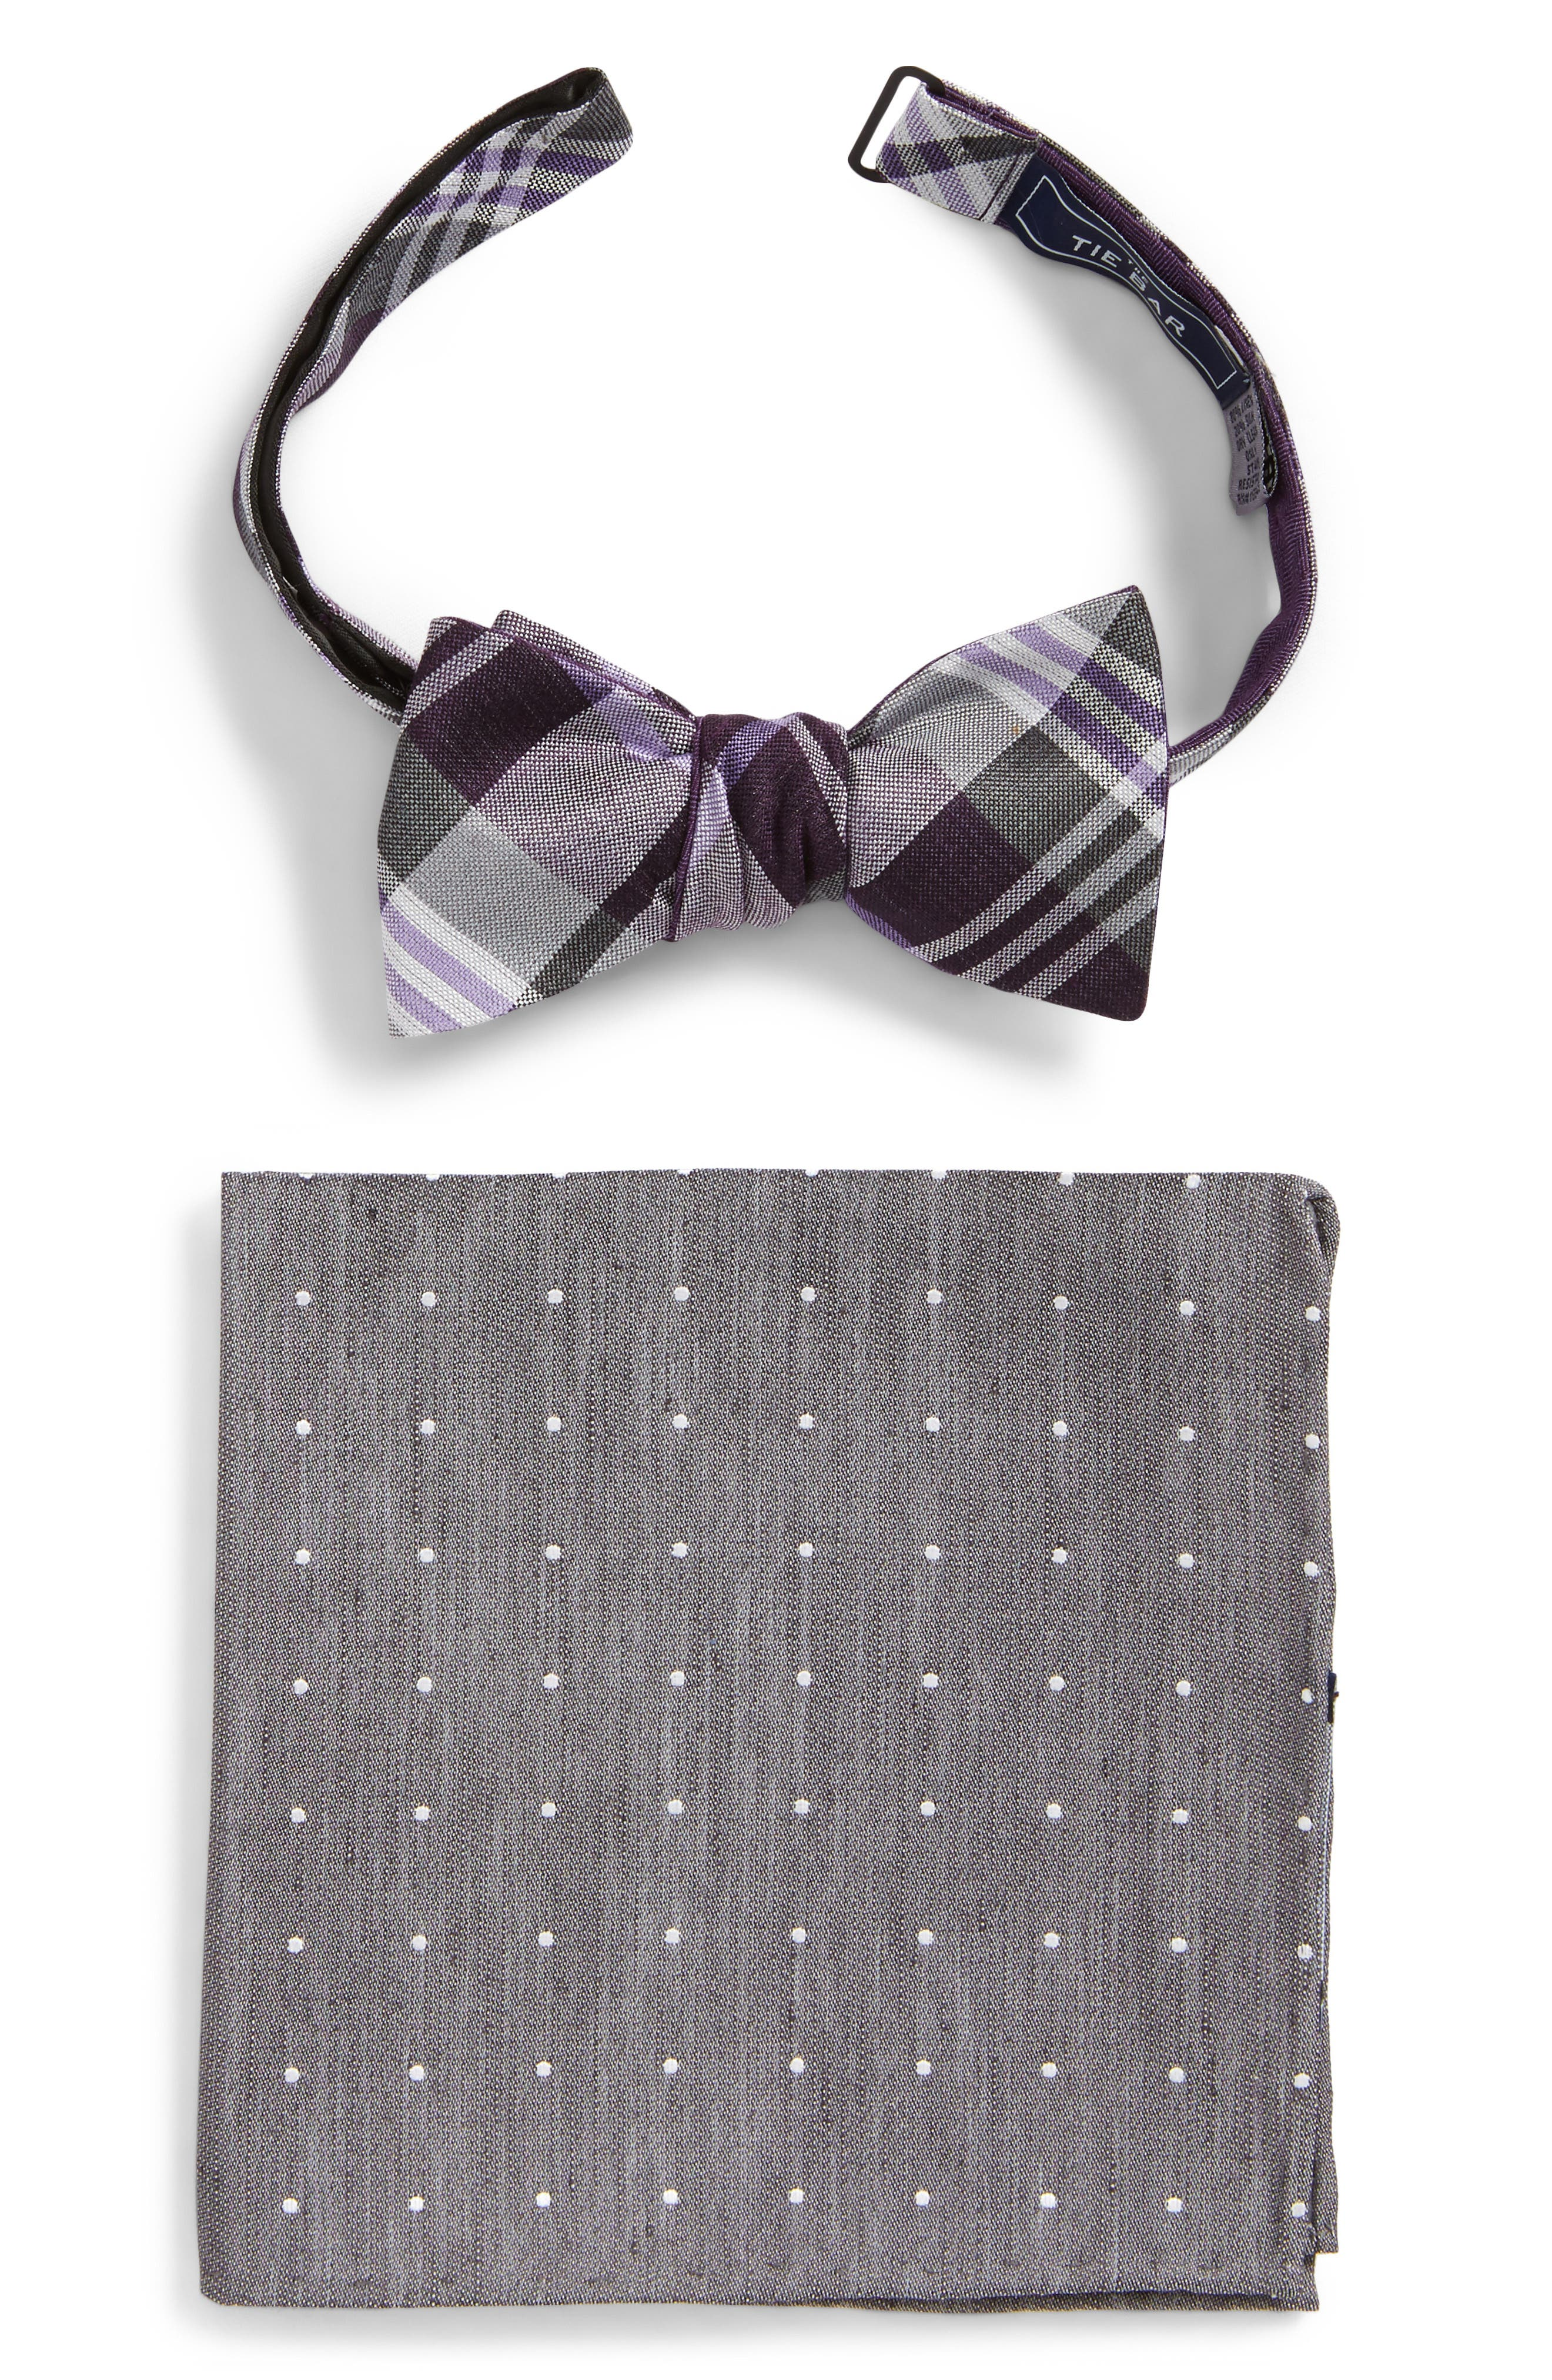 Crystal Wave Bow Tie & Pocket Square Box Set,                         Main,                         color, Eggplant